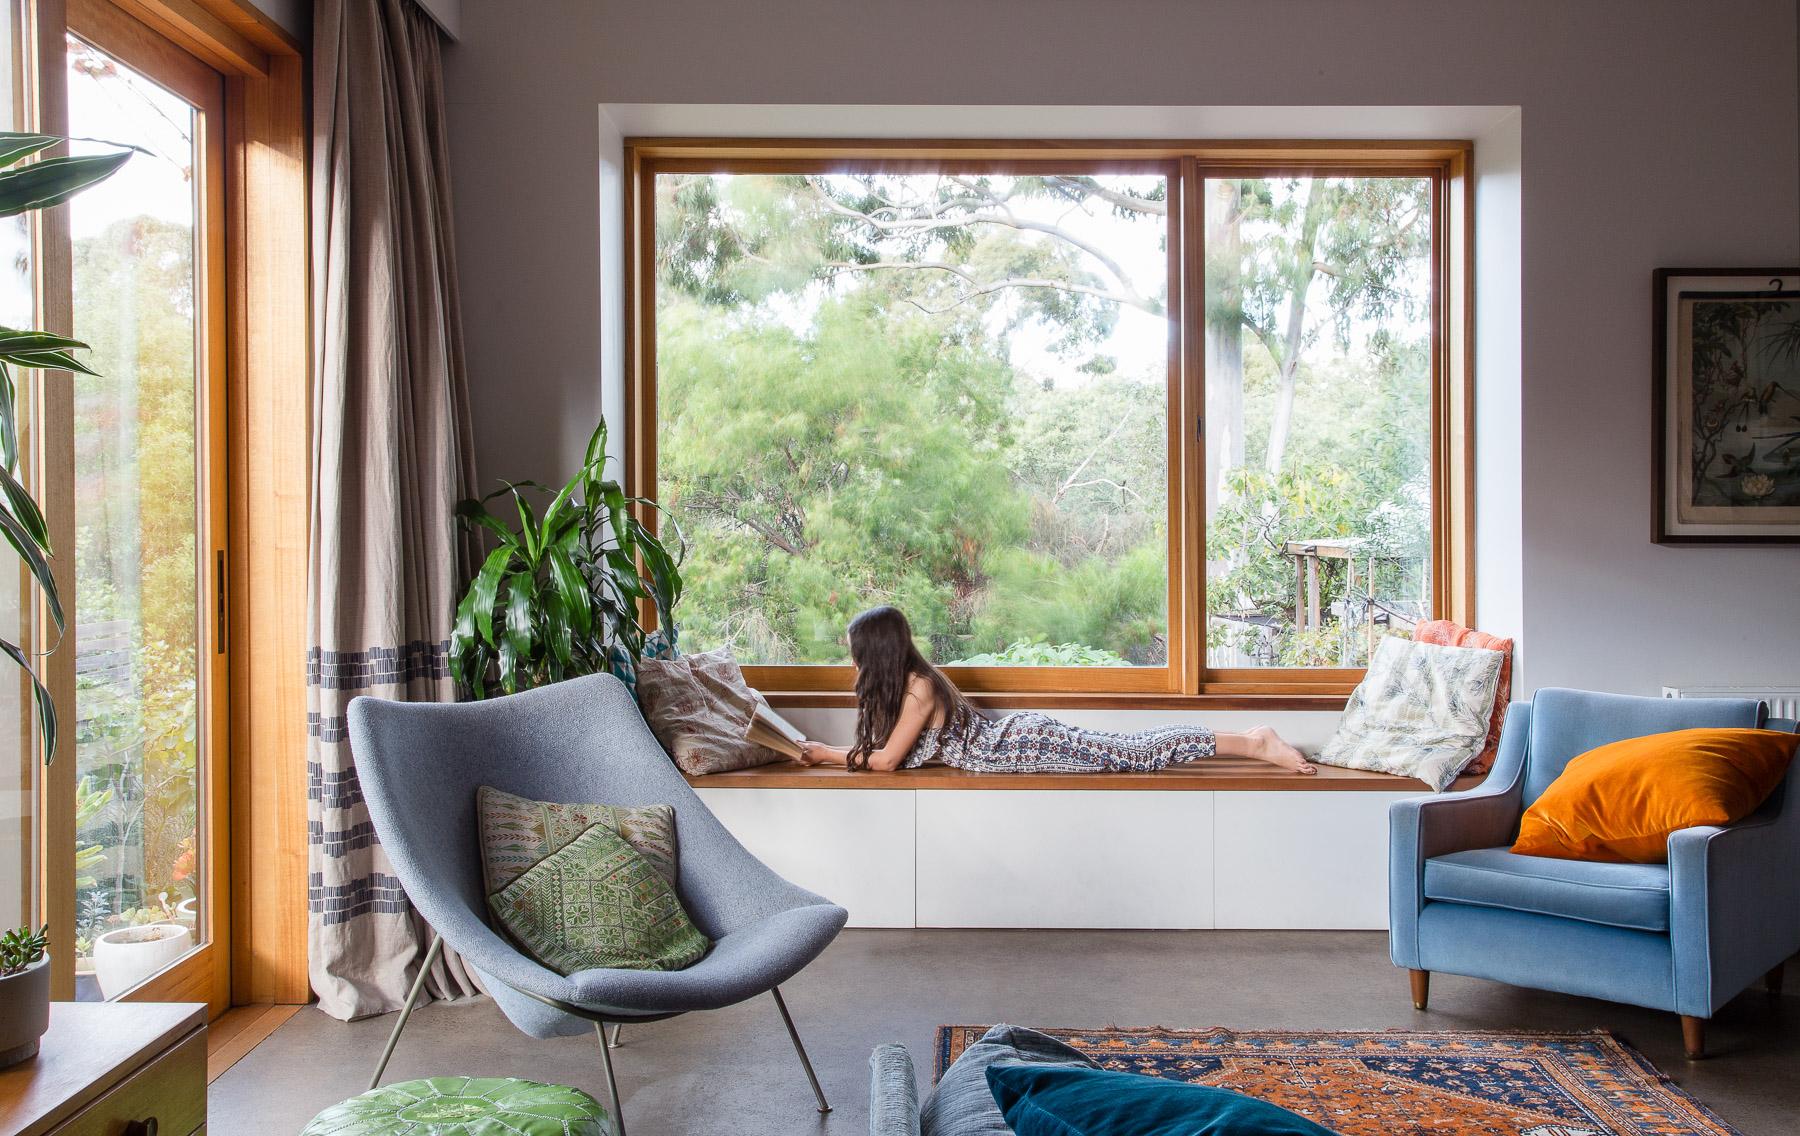 brave+new+eco+sustainable+interior+design (6).jpeg